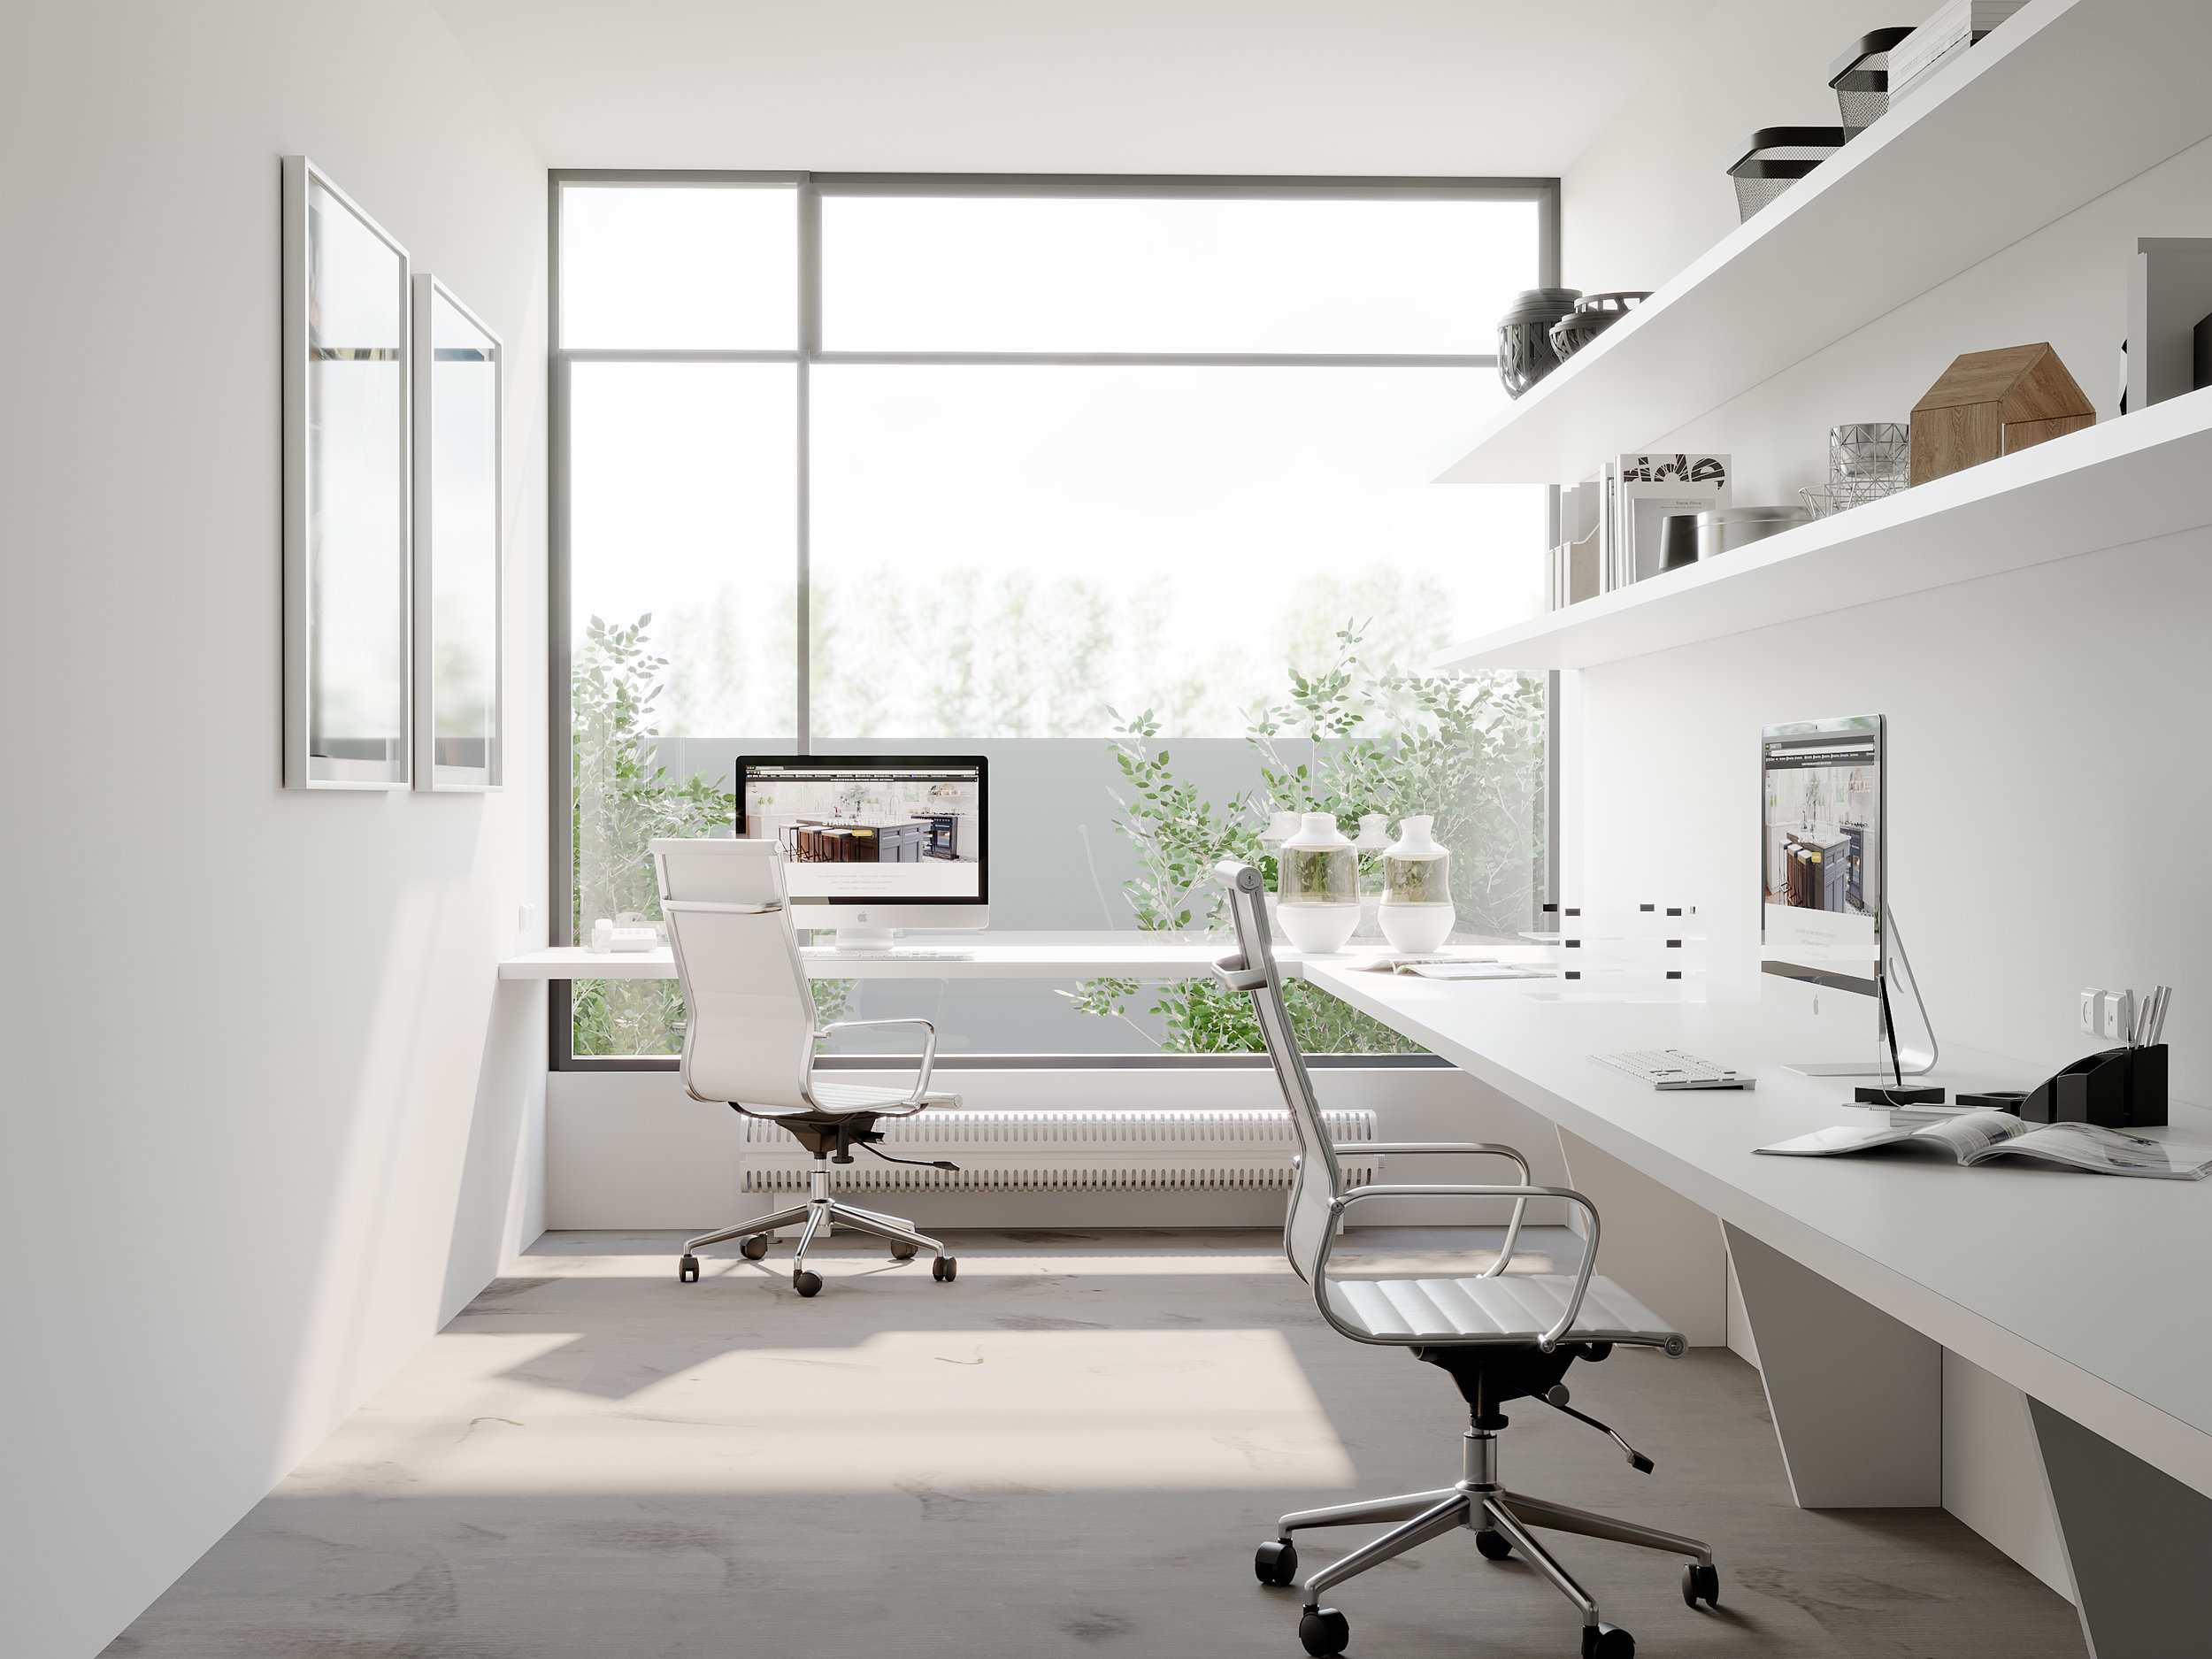 Benny's Office